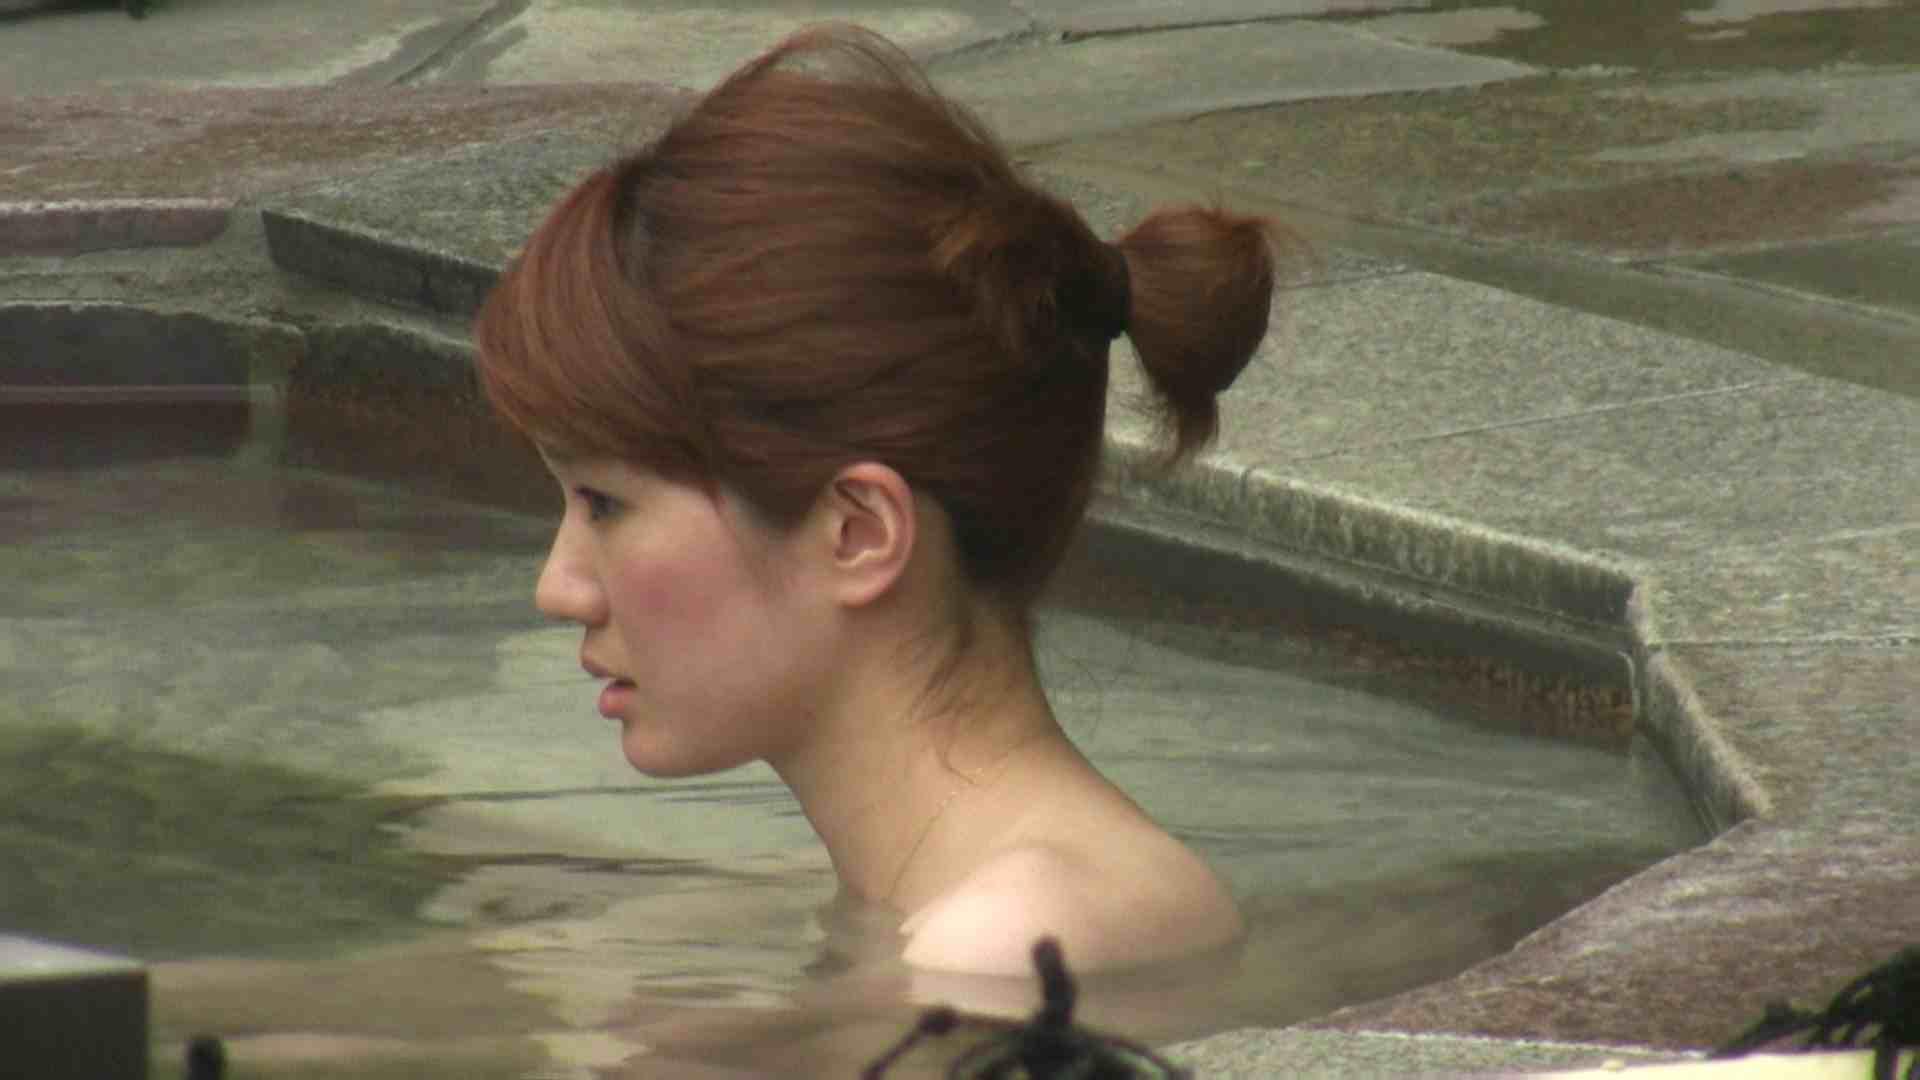 Aquaな露天風呂Vol.110 盗撮映像  46Pix 21